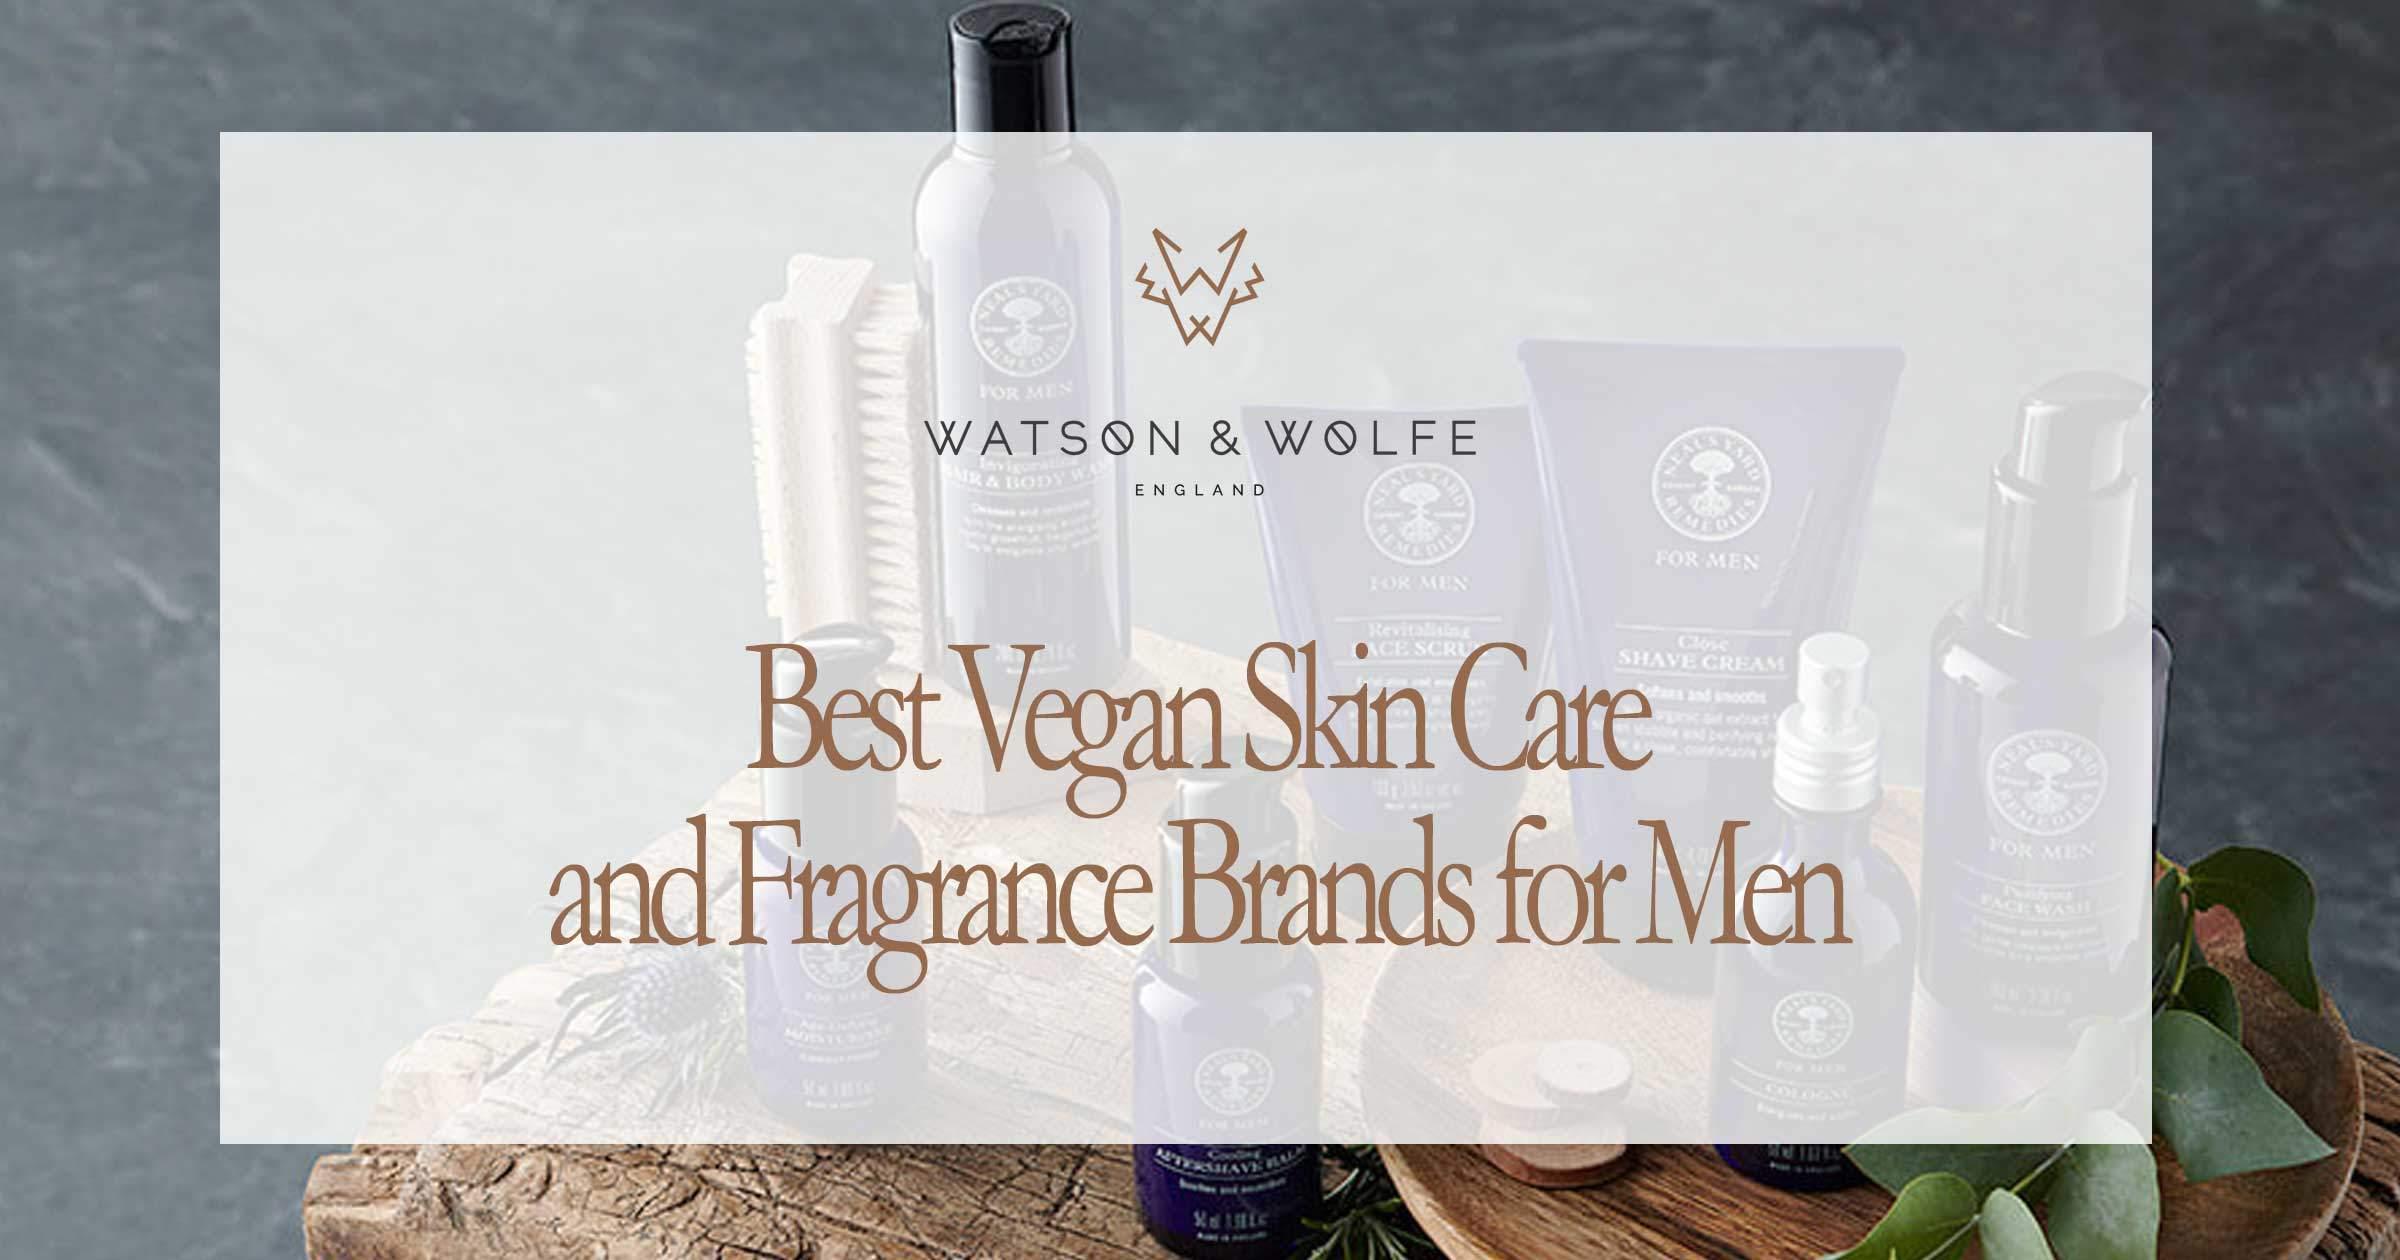 Best Vegan Skincare for Men | Watson & Wolfe